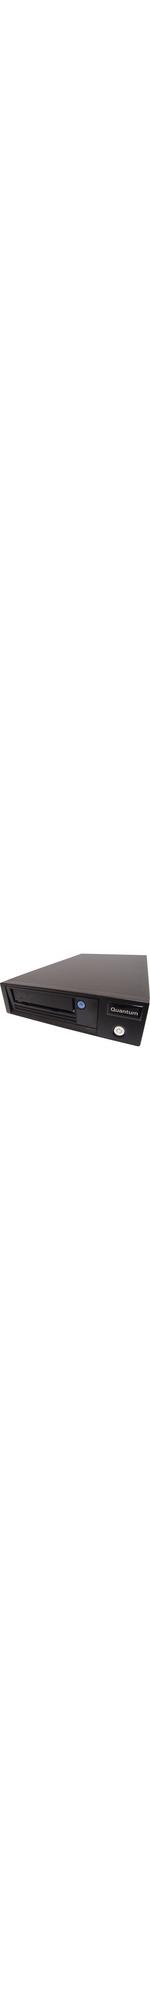 Quantum LTO-6 Tape Drive - 2.50 TB Native/6.25 TB Compressed - SAS - 1/2H Height - 1U Rack Height